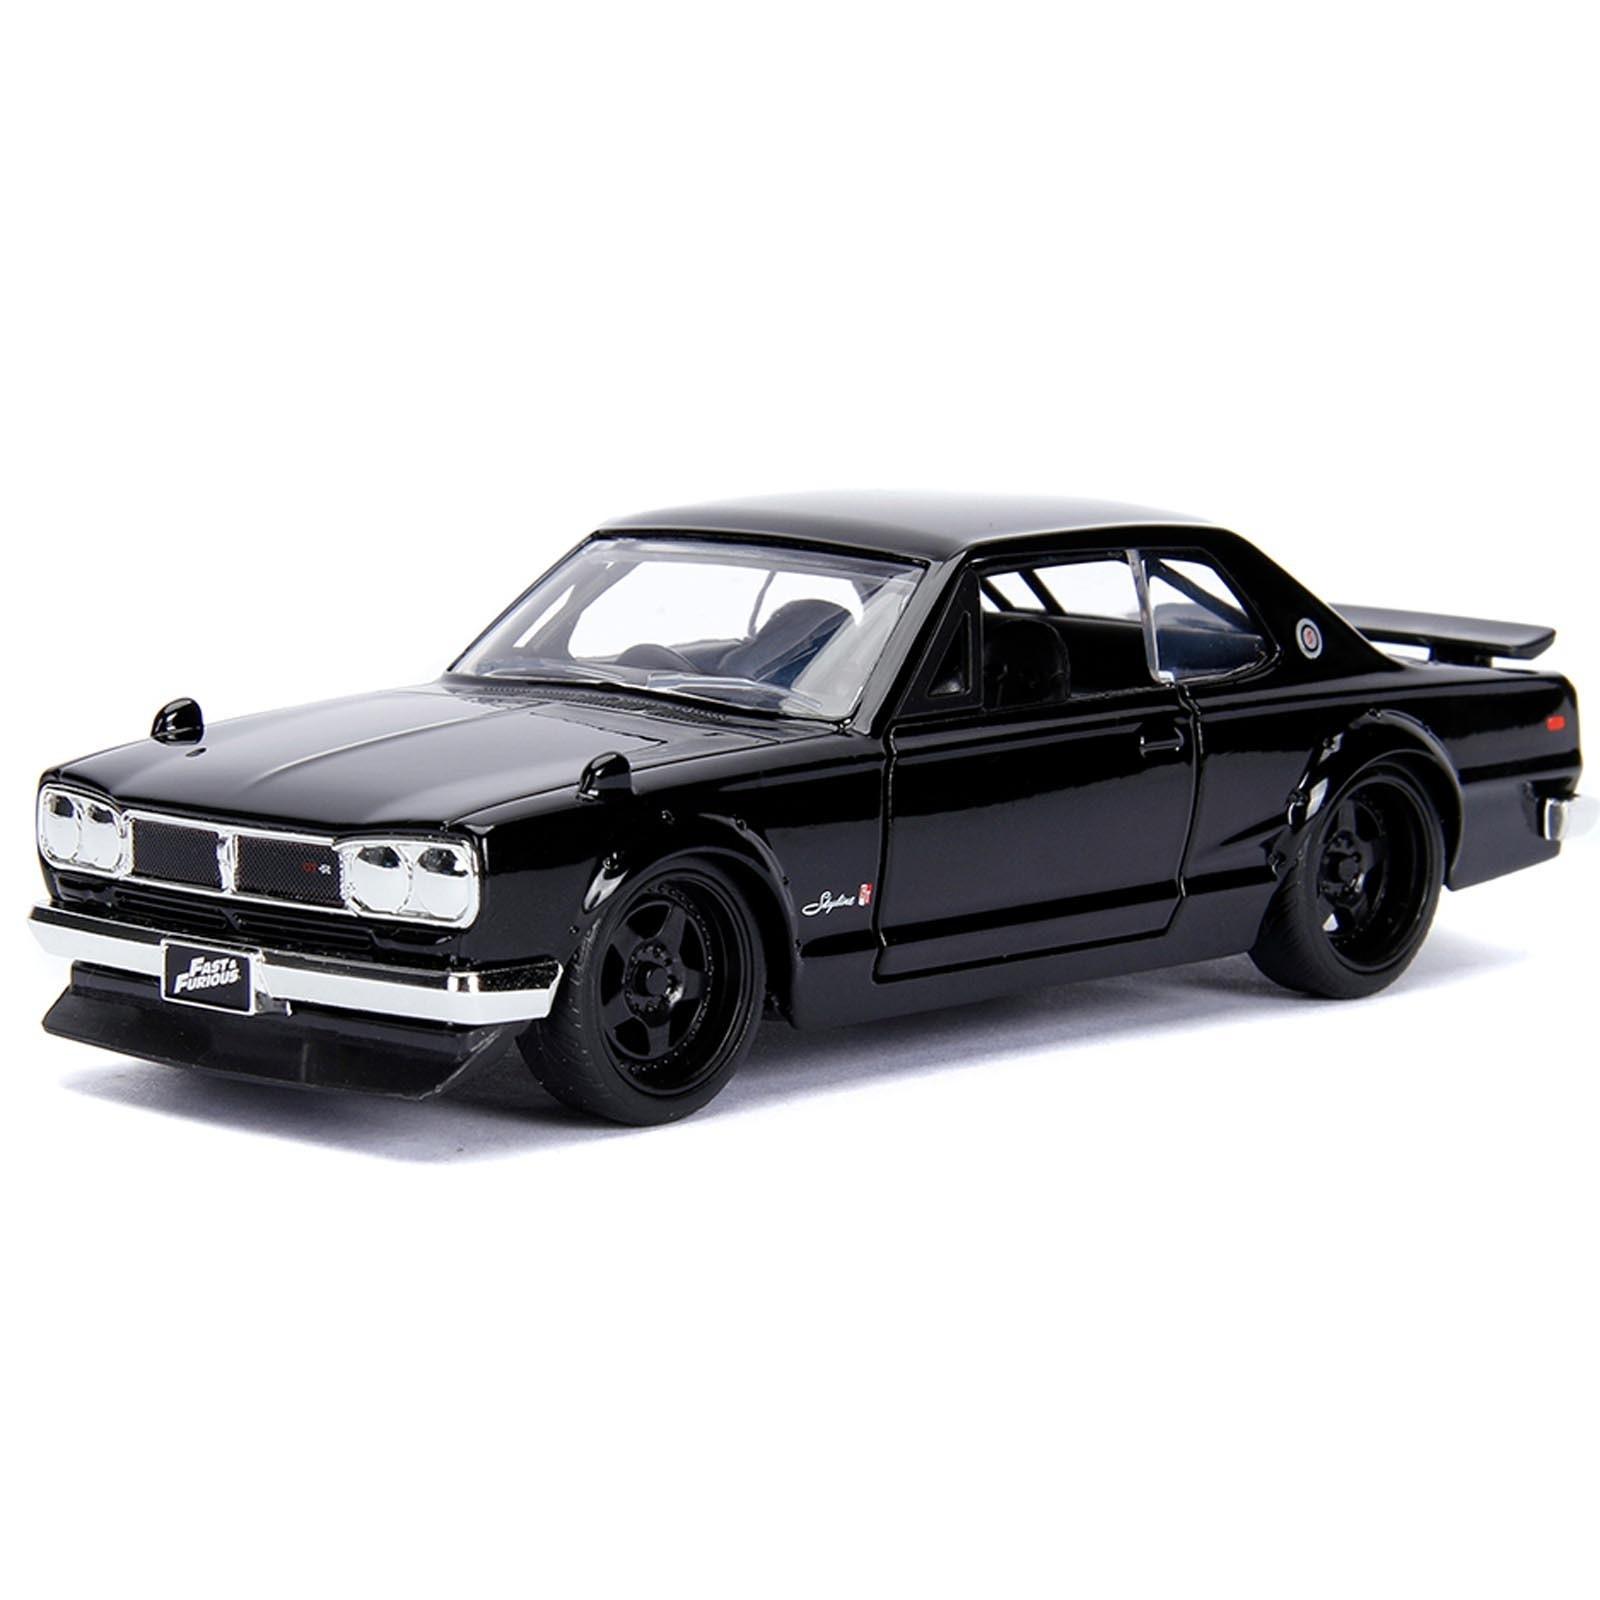 Carro Nissan Skyline Z000 GT-R (KPGC10) ''Brian's'': Velozes e Furiosos (Die Cast Figure) Escala 1/24 - Jada Toys